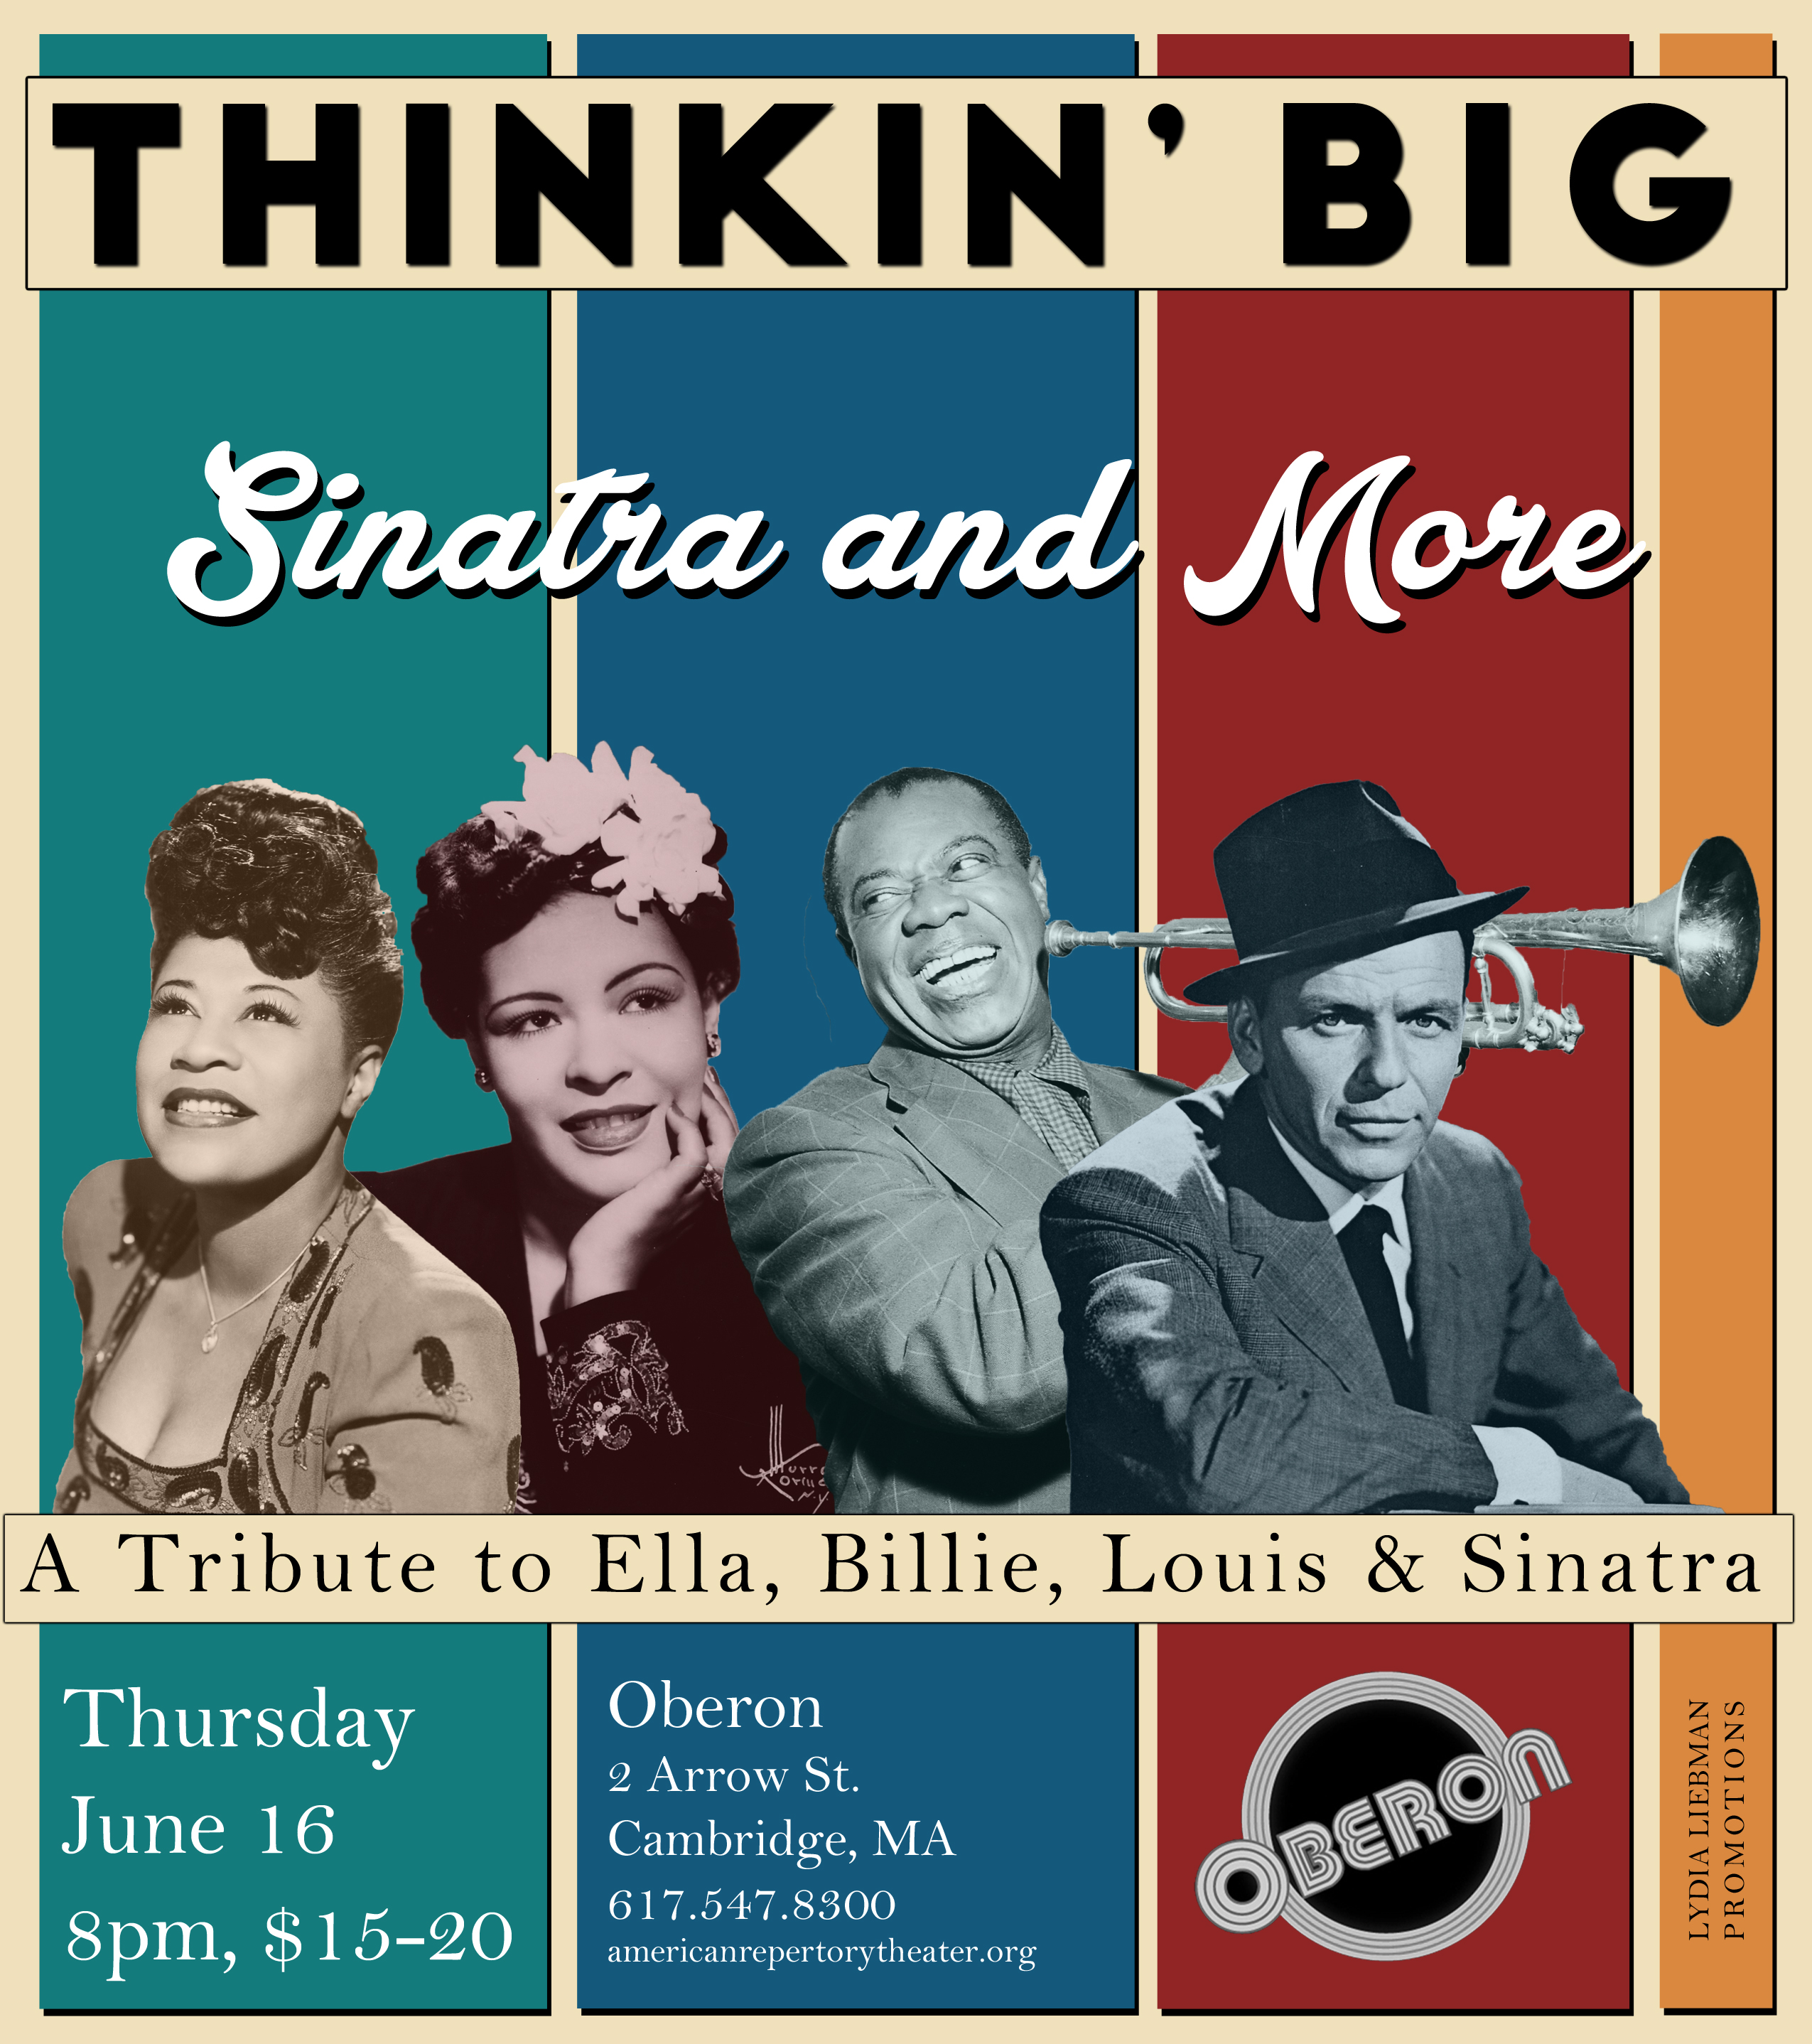 Thinkin' Big Returns to Oberon for Sinatra, Billie, Ella, and Louis Tribute!